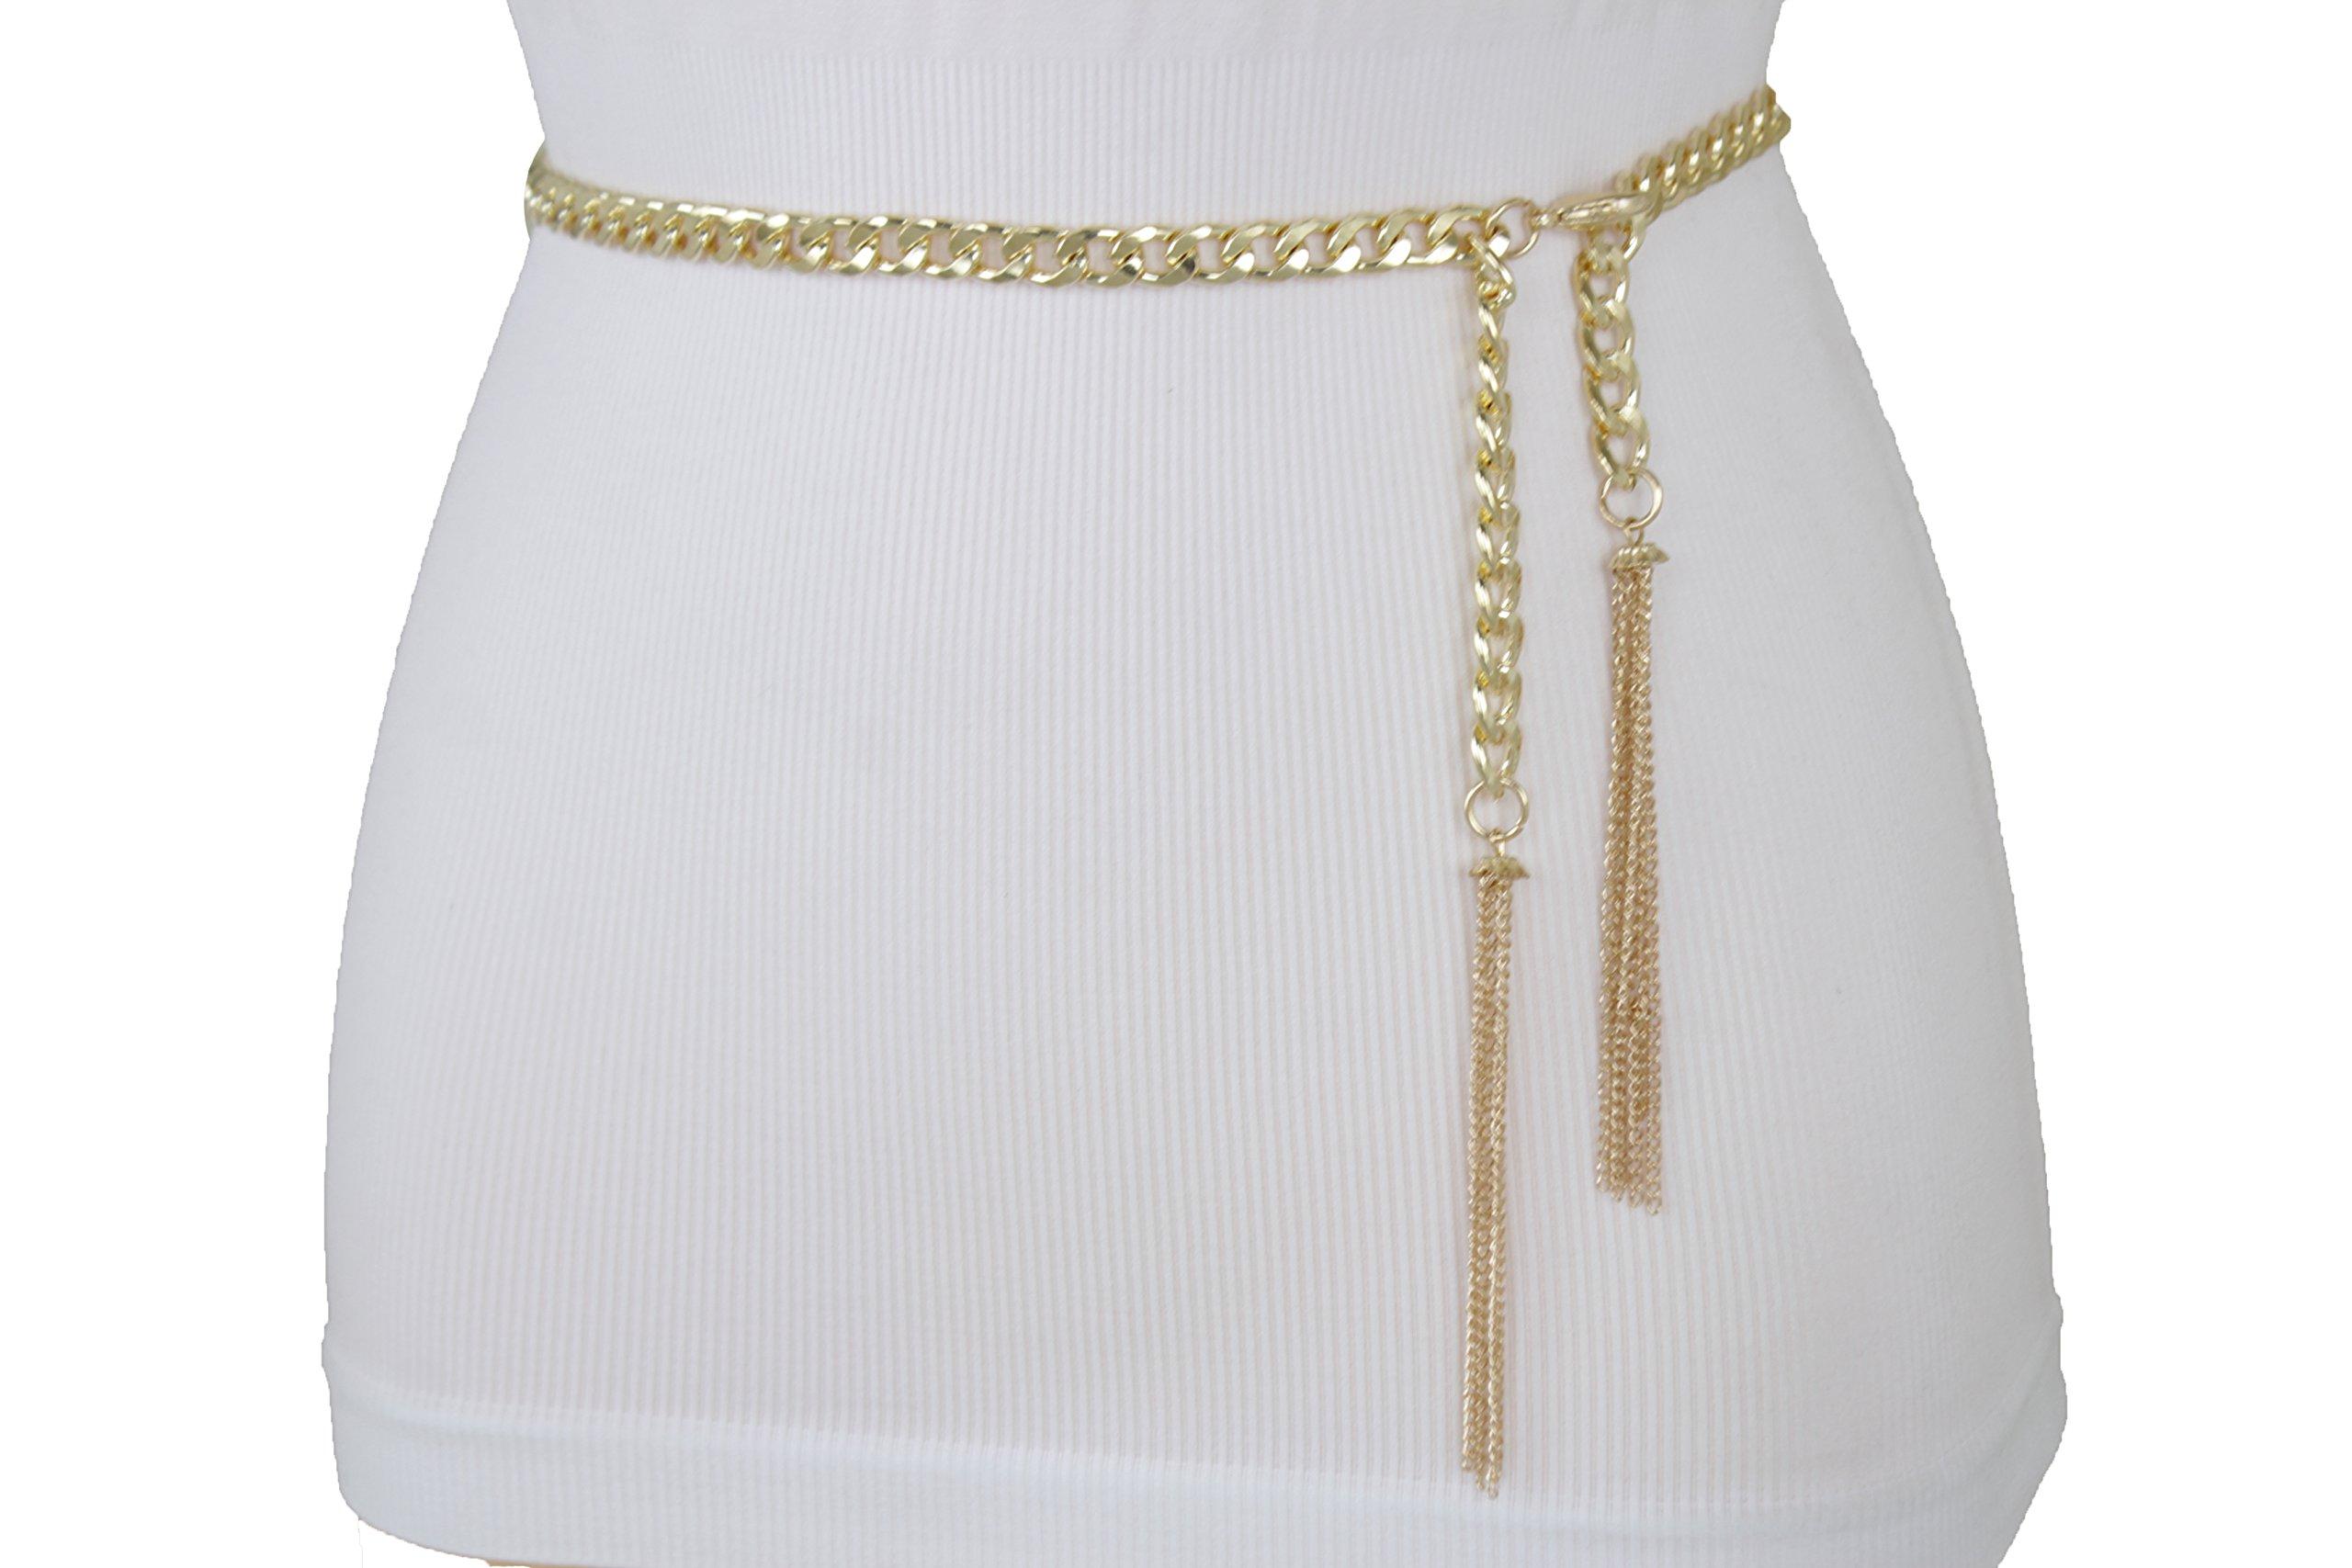 TFJ Women Fashion Metal Chain Belt Hip Waist Turquoise Blue Coins Gold Plus M L XL